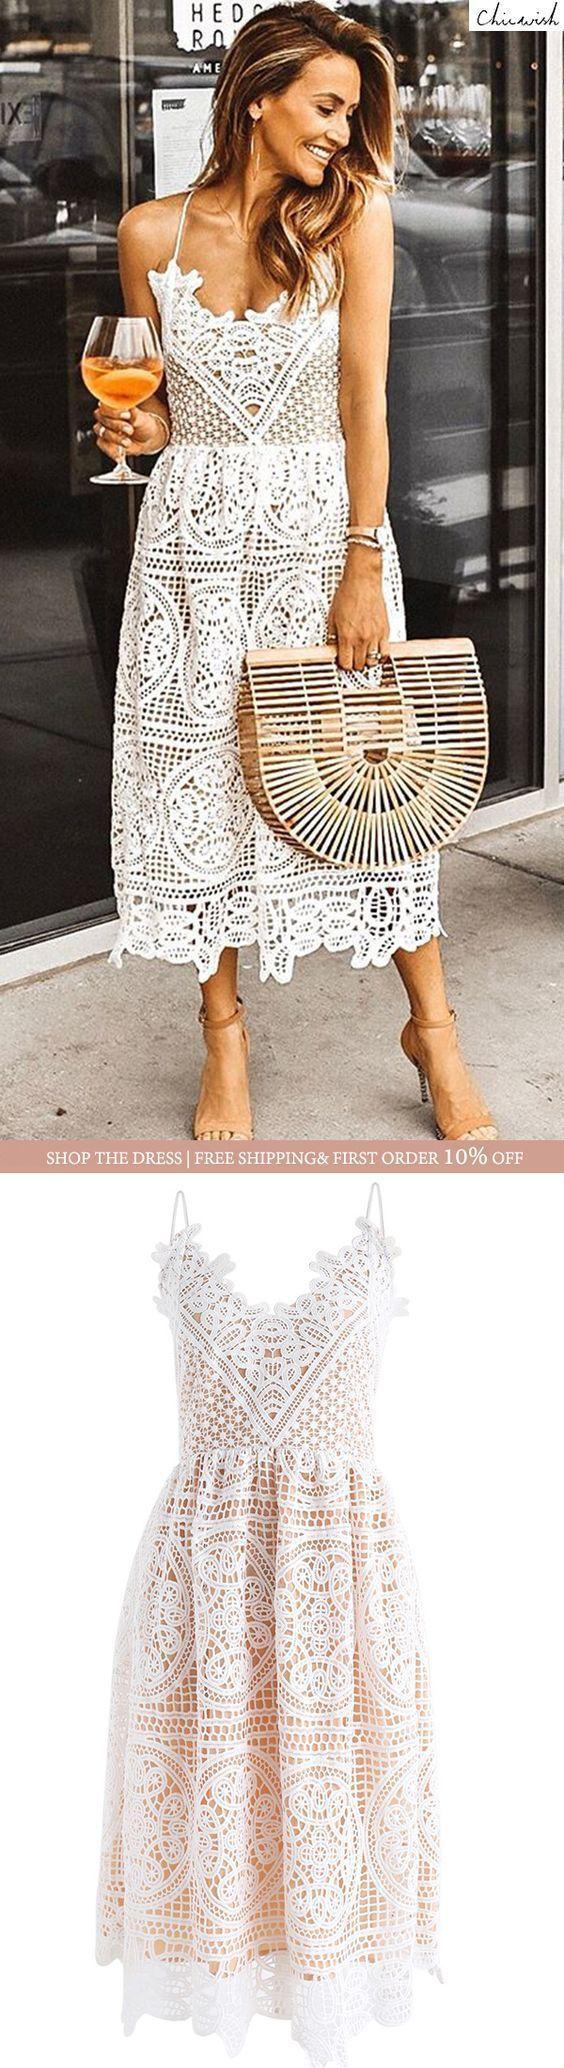 Ad chicwish womenus white cross back crochet eyelet cami midi dress